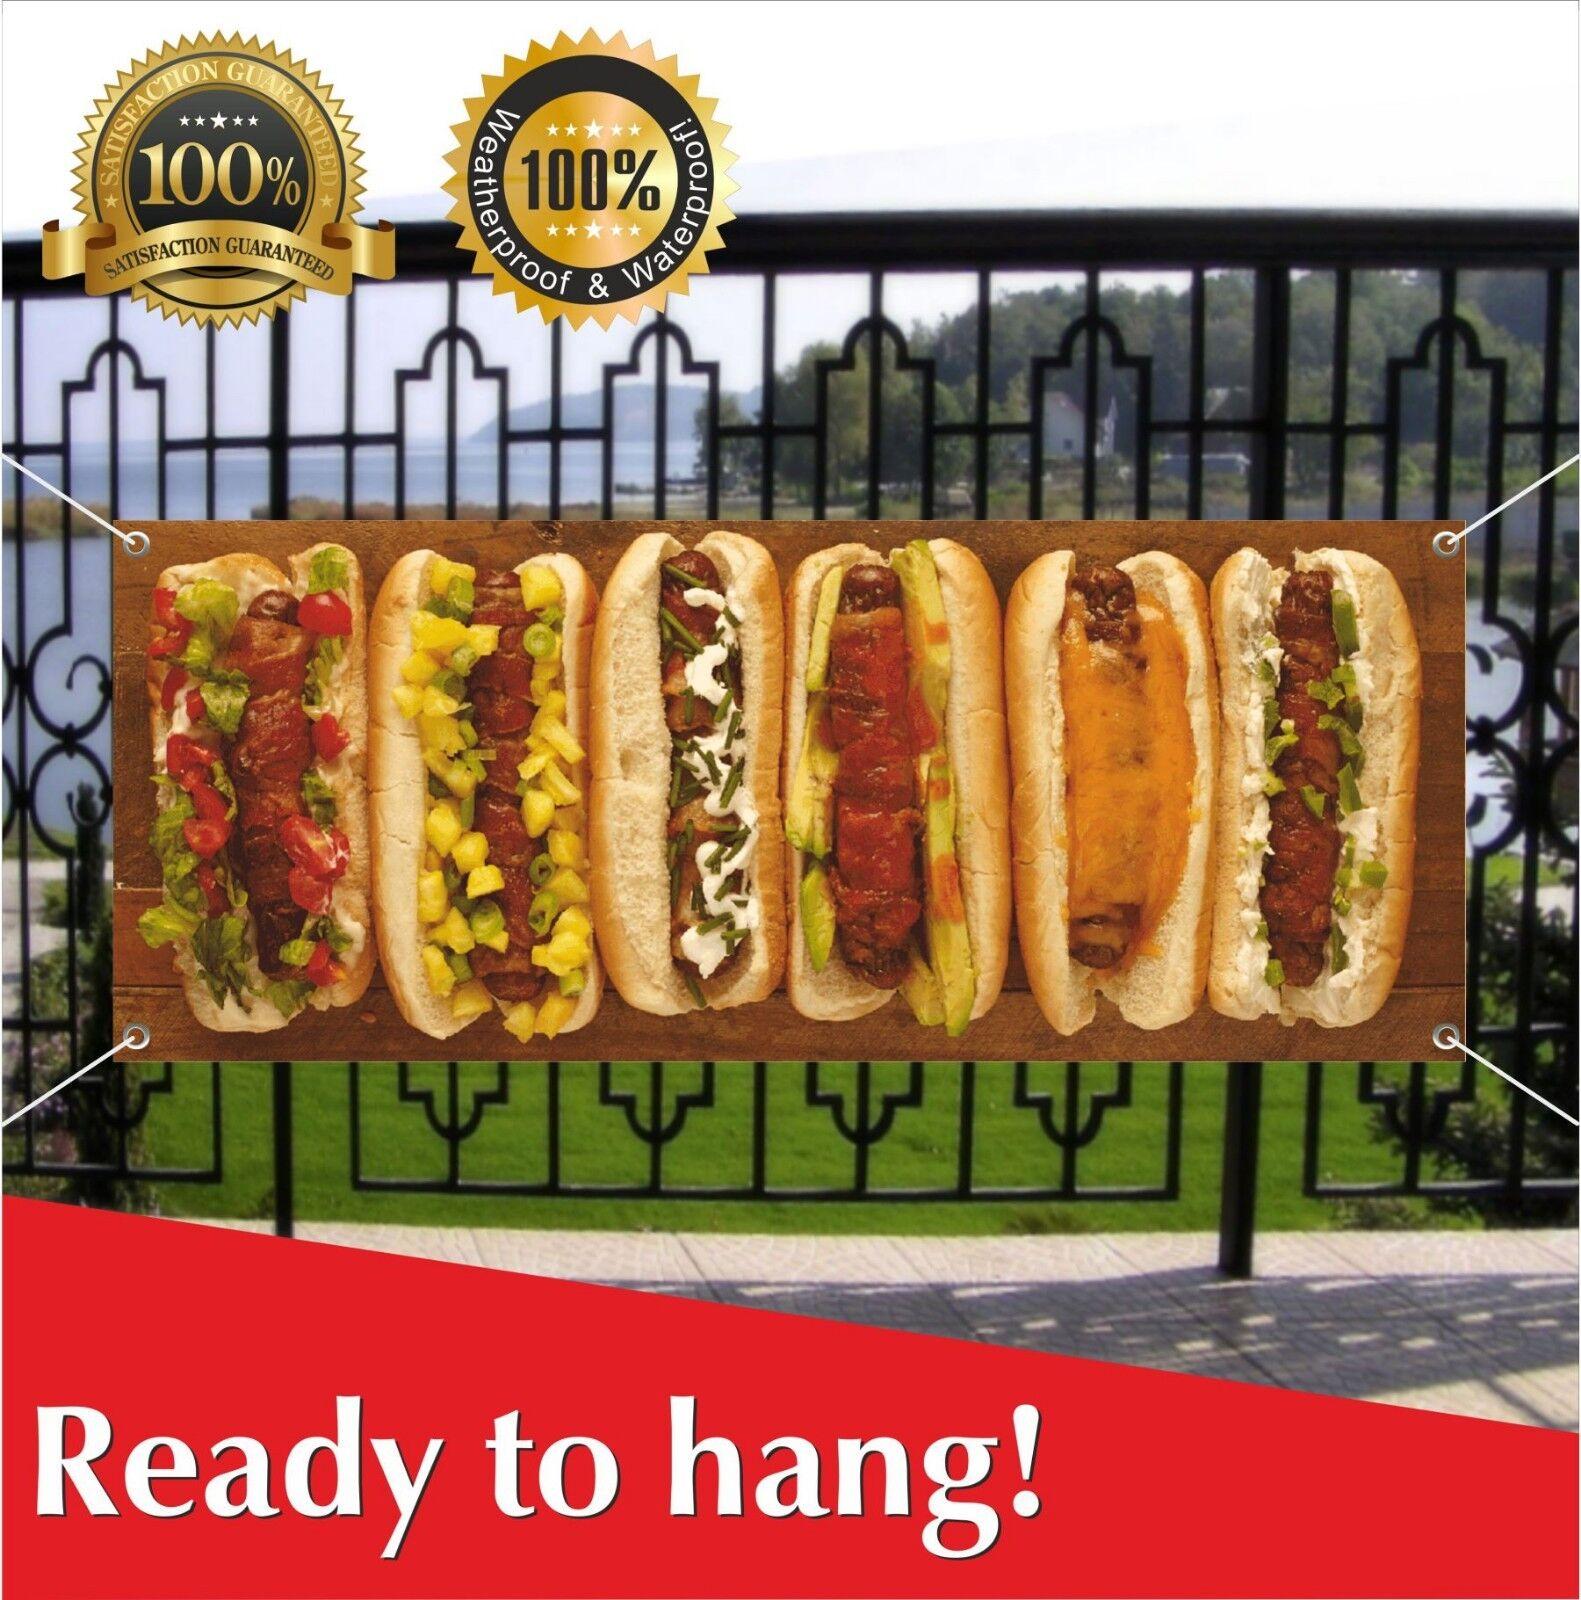 HOT DOGS Banner Vinyl / Mesh Banner Sign Flag Fast Food Cafe Bar Burgers Hotdogs - $17.56